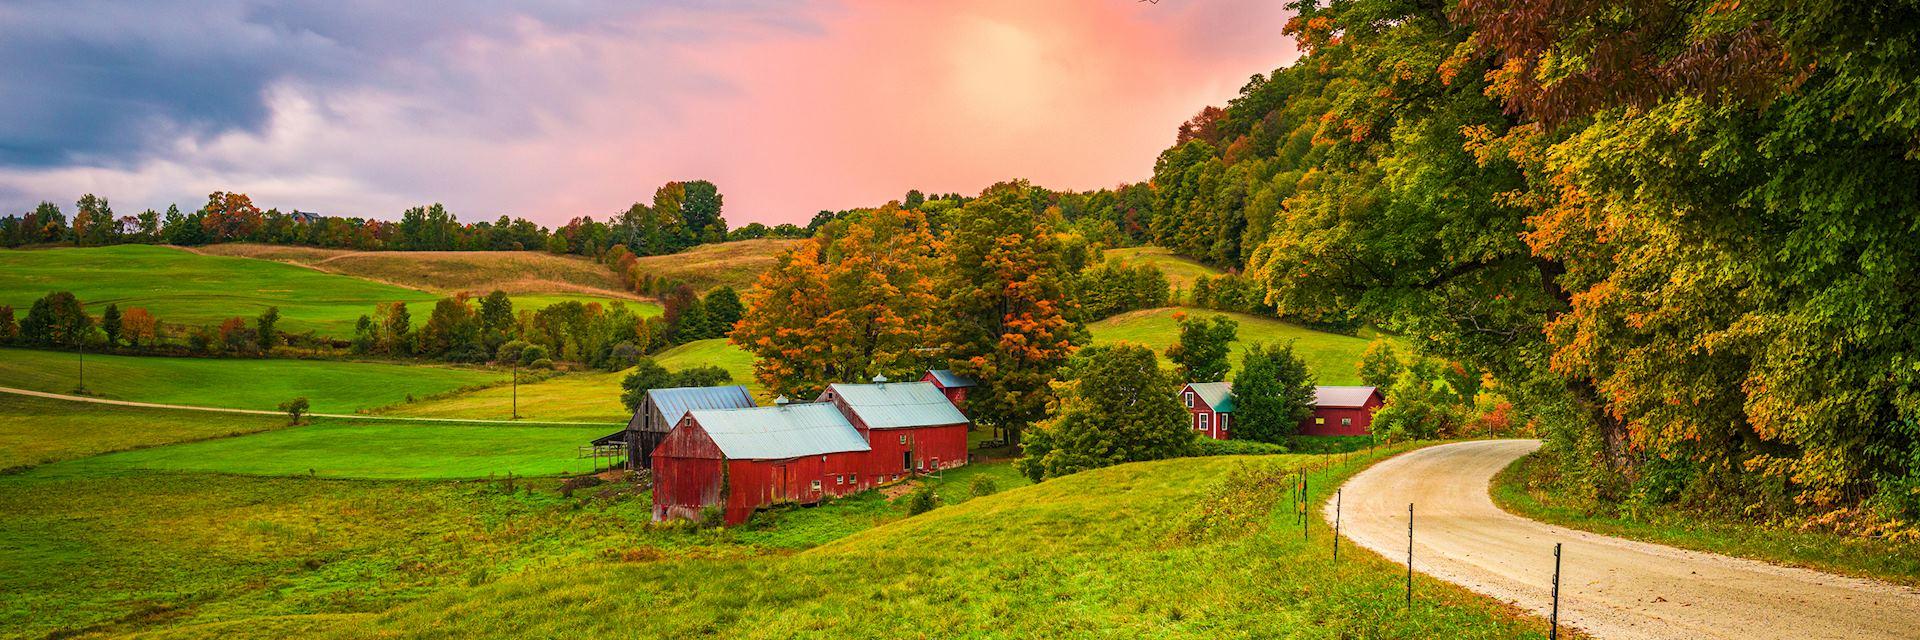 Vermont farm, New England